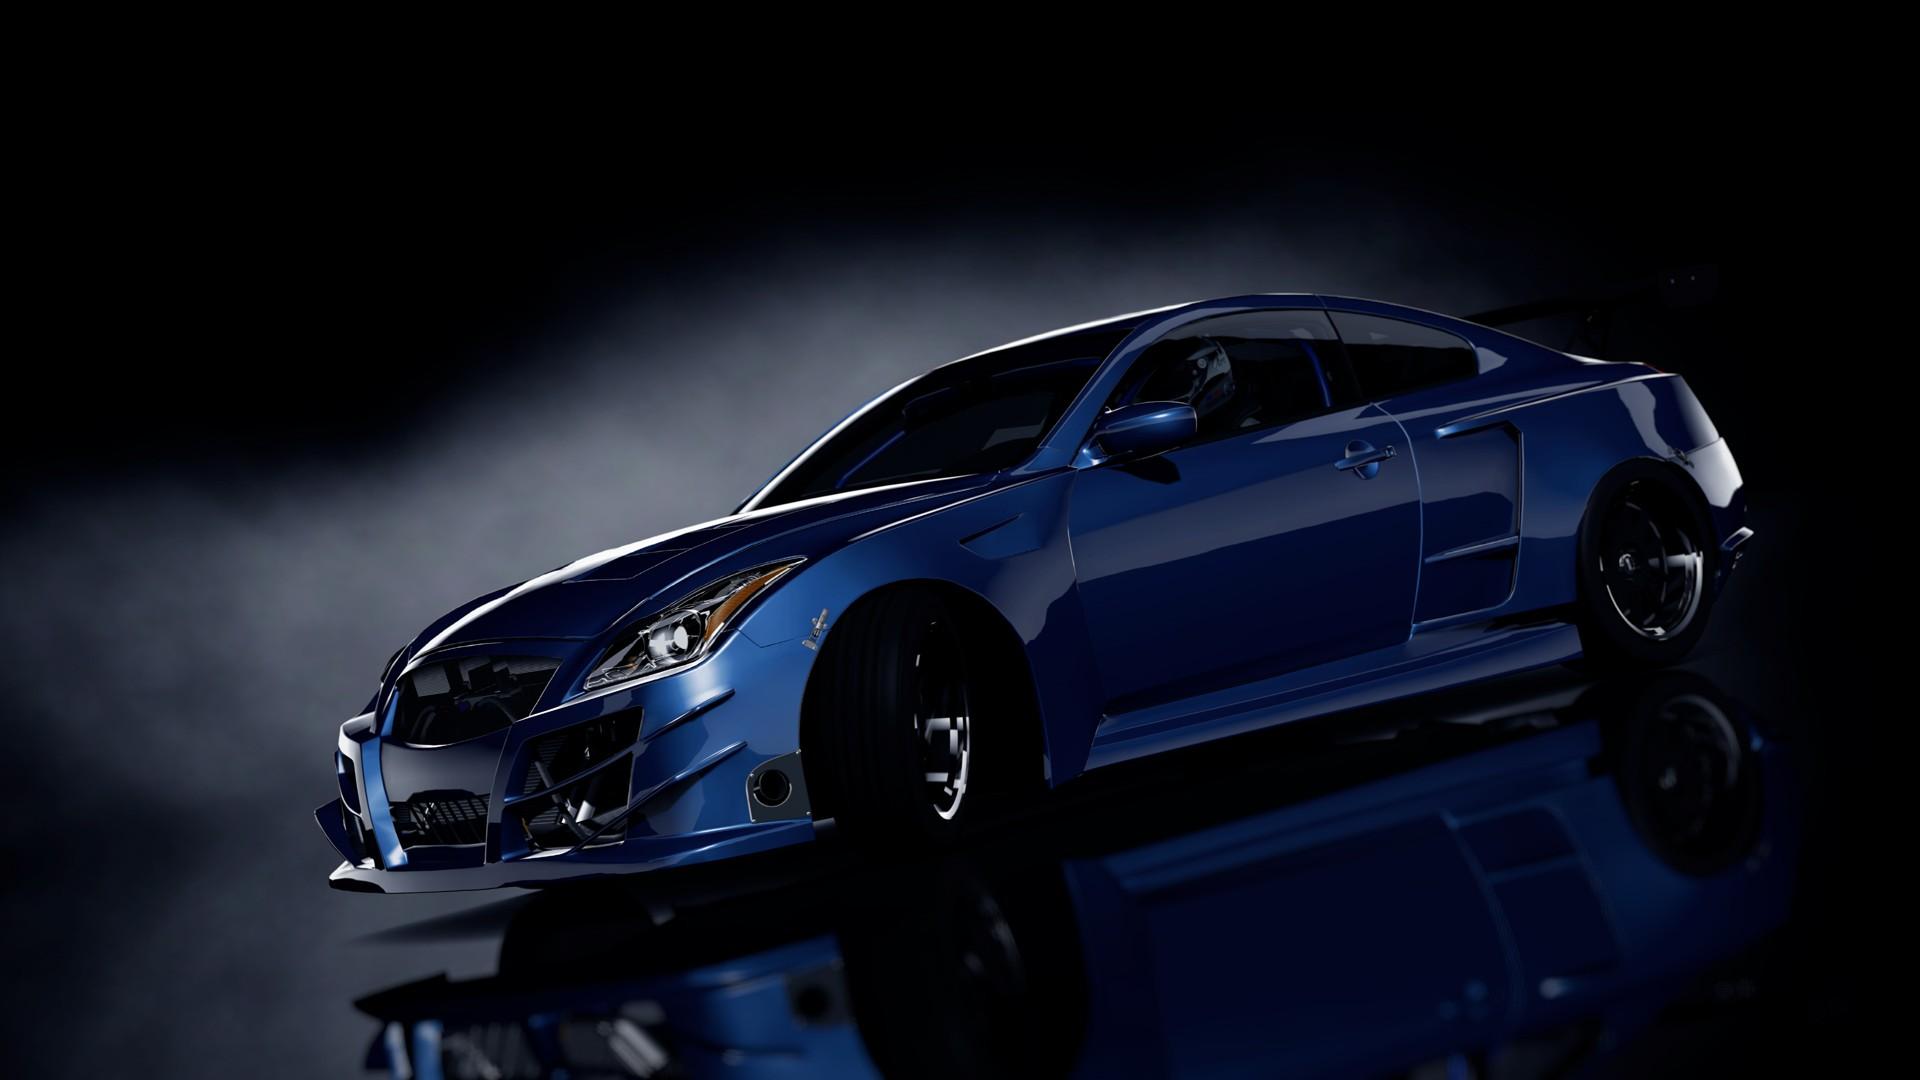 16 Luxury Pubg Wallpaper Iphone 6: Wallpaper : Black Background, 3D, Blue Cars, Technology